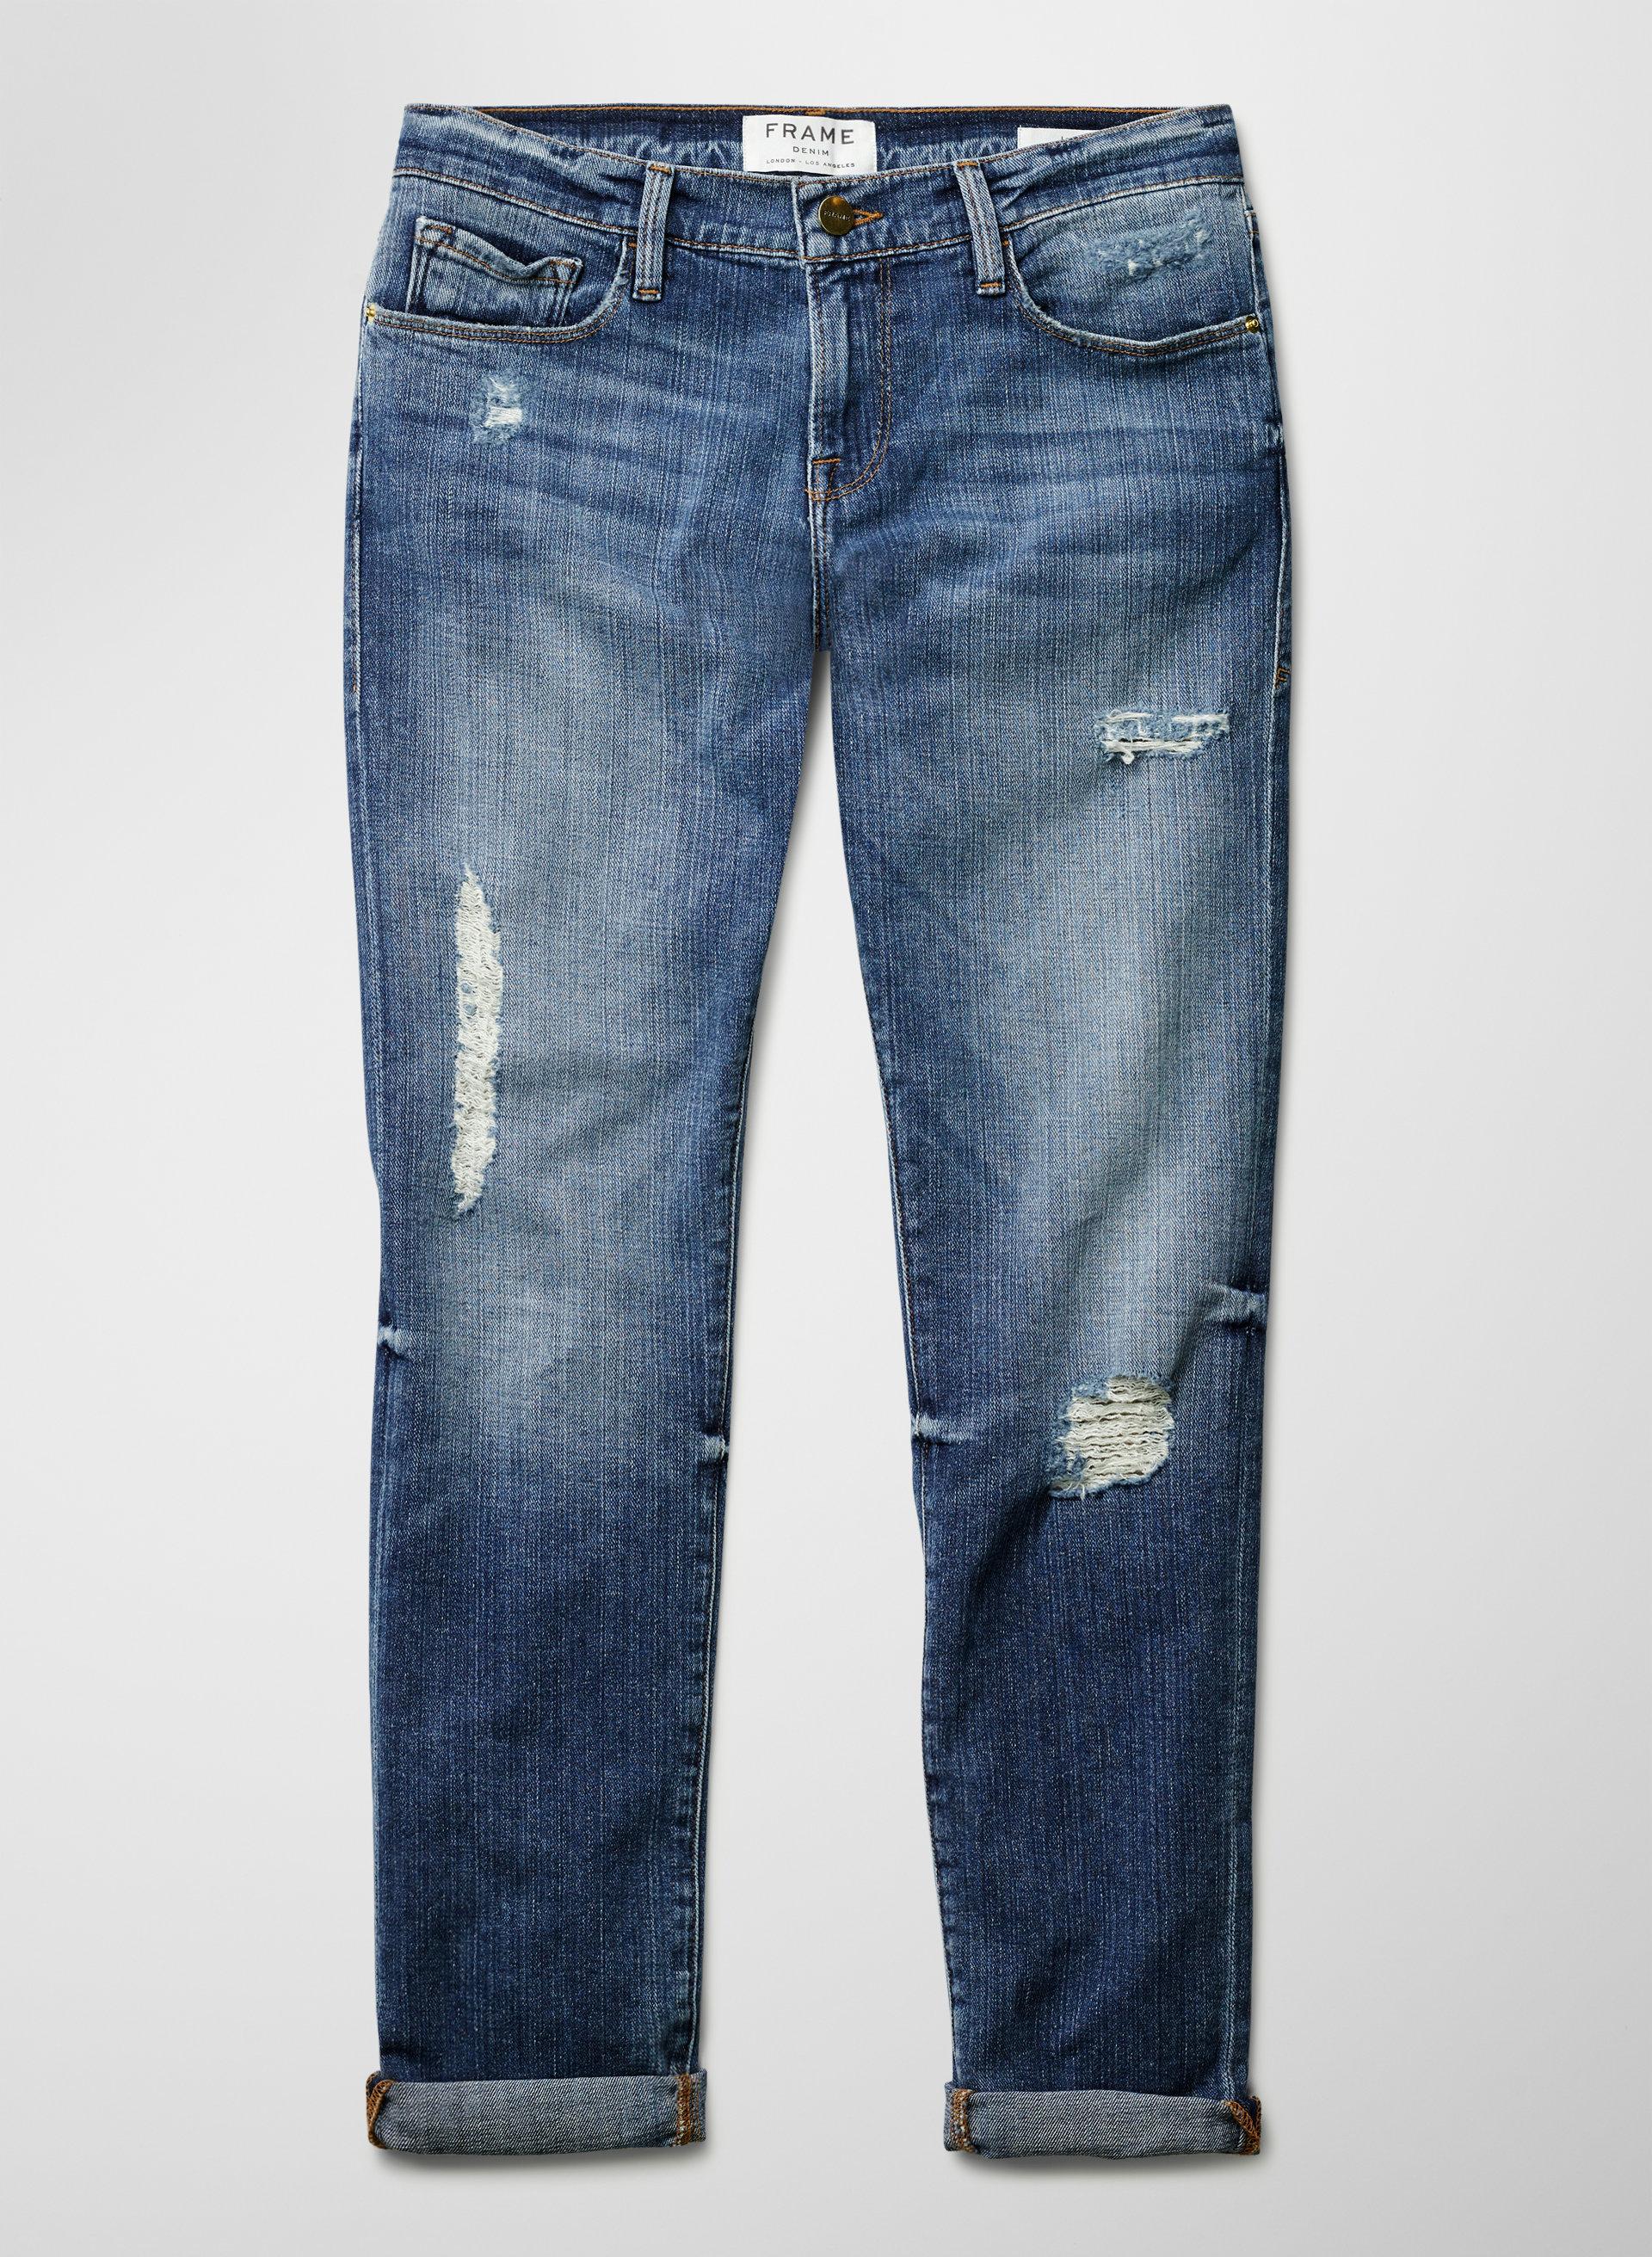 Frame Denim Le Garcon Jeans